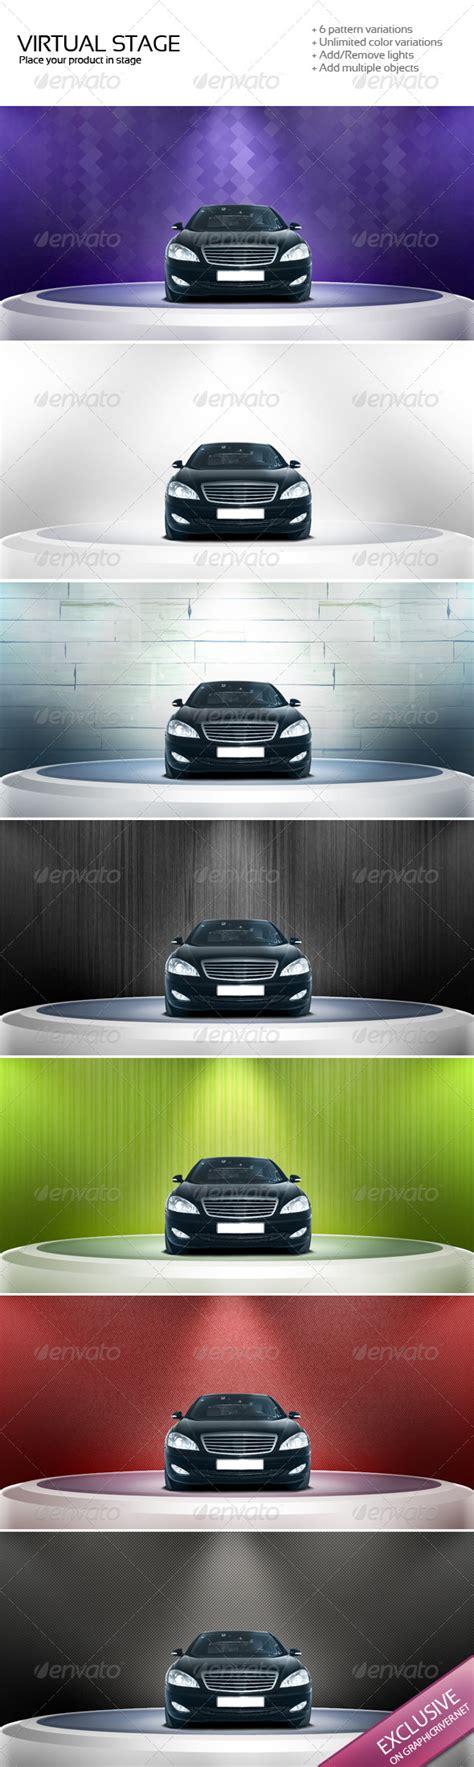 Eurotic Tv Lilian Filmvz Portal Picture | Car Interior Design